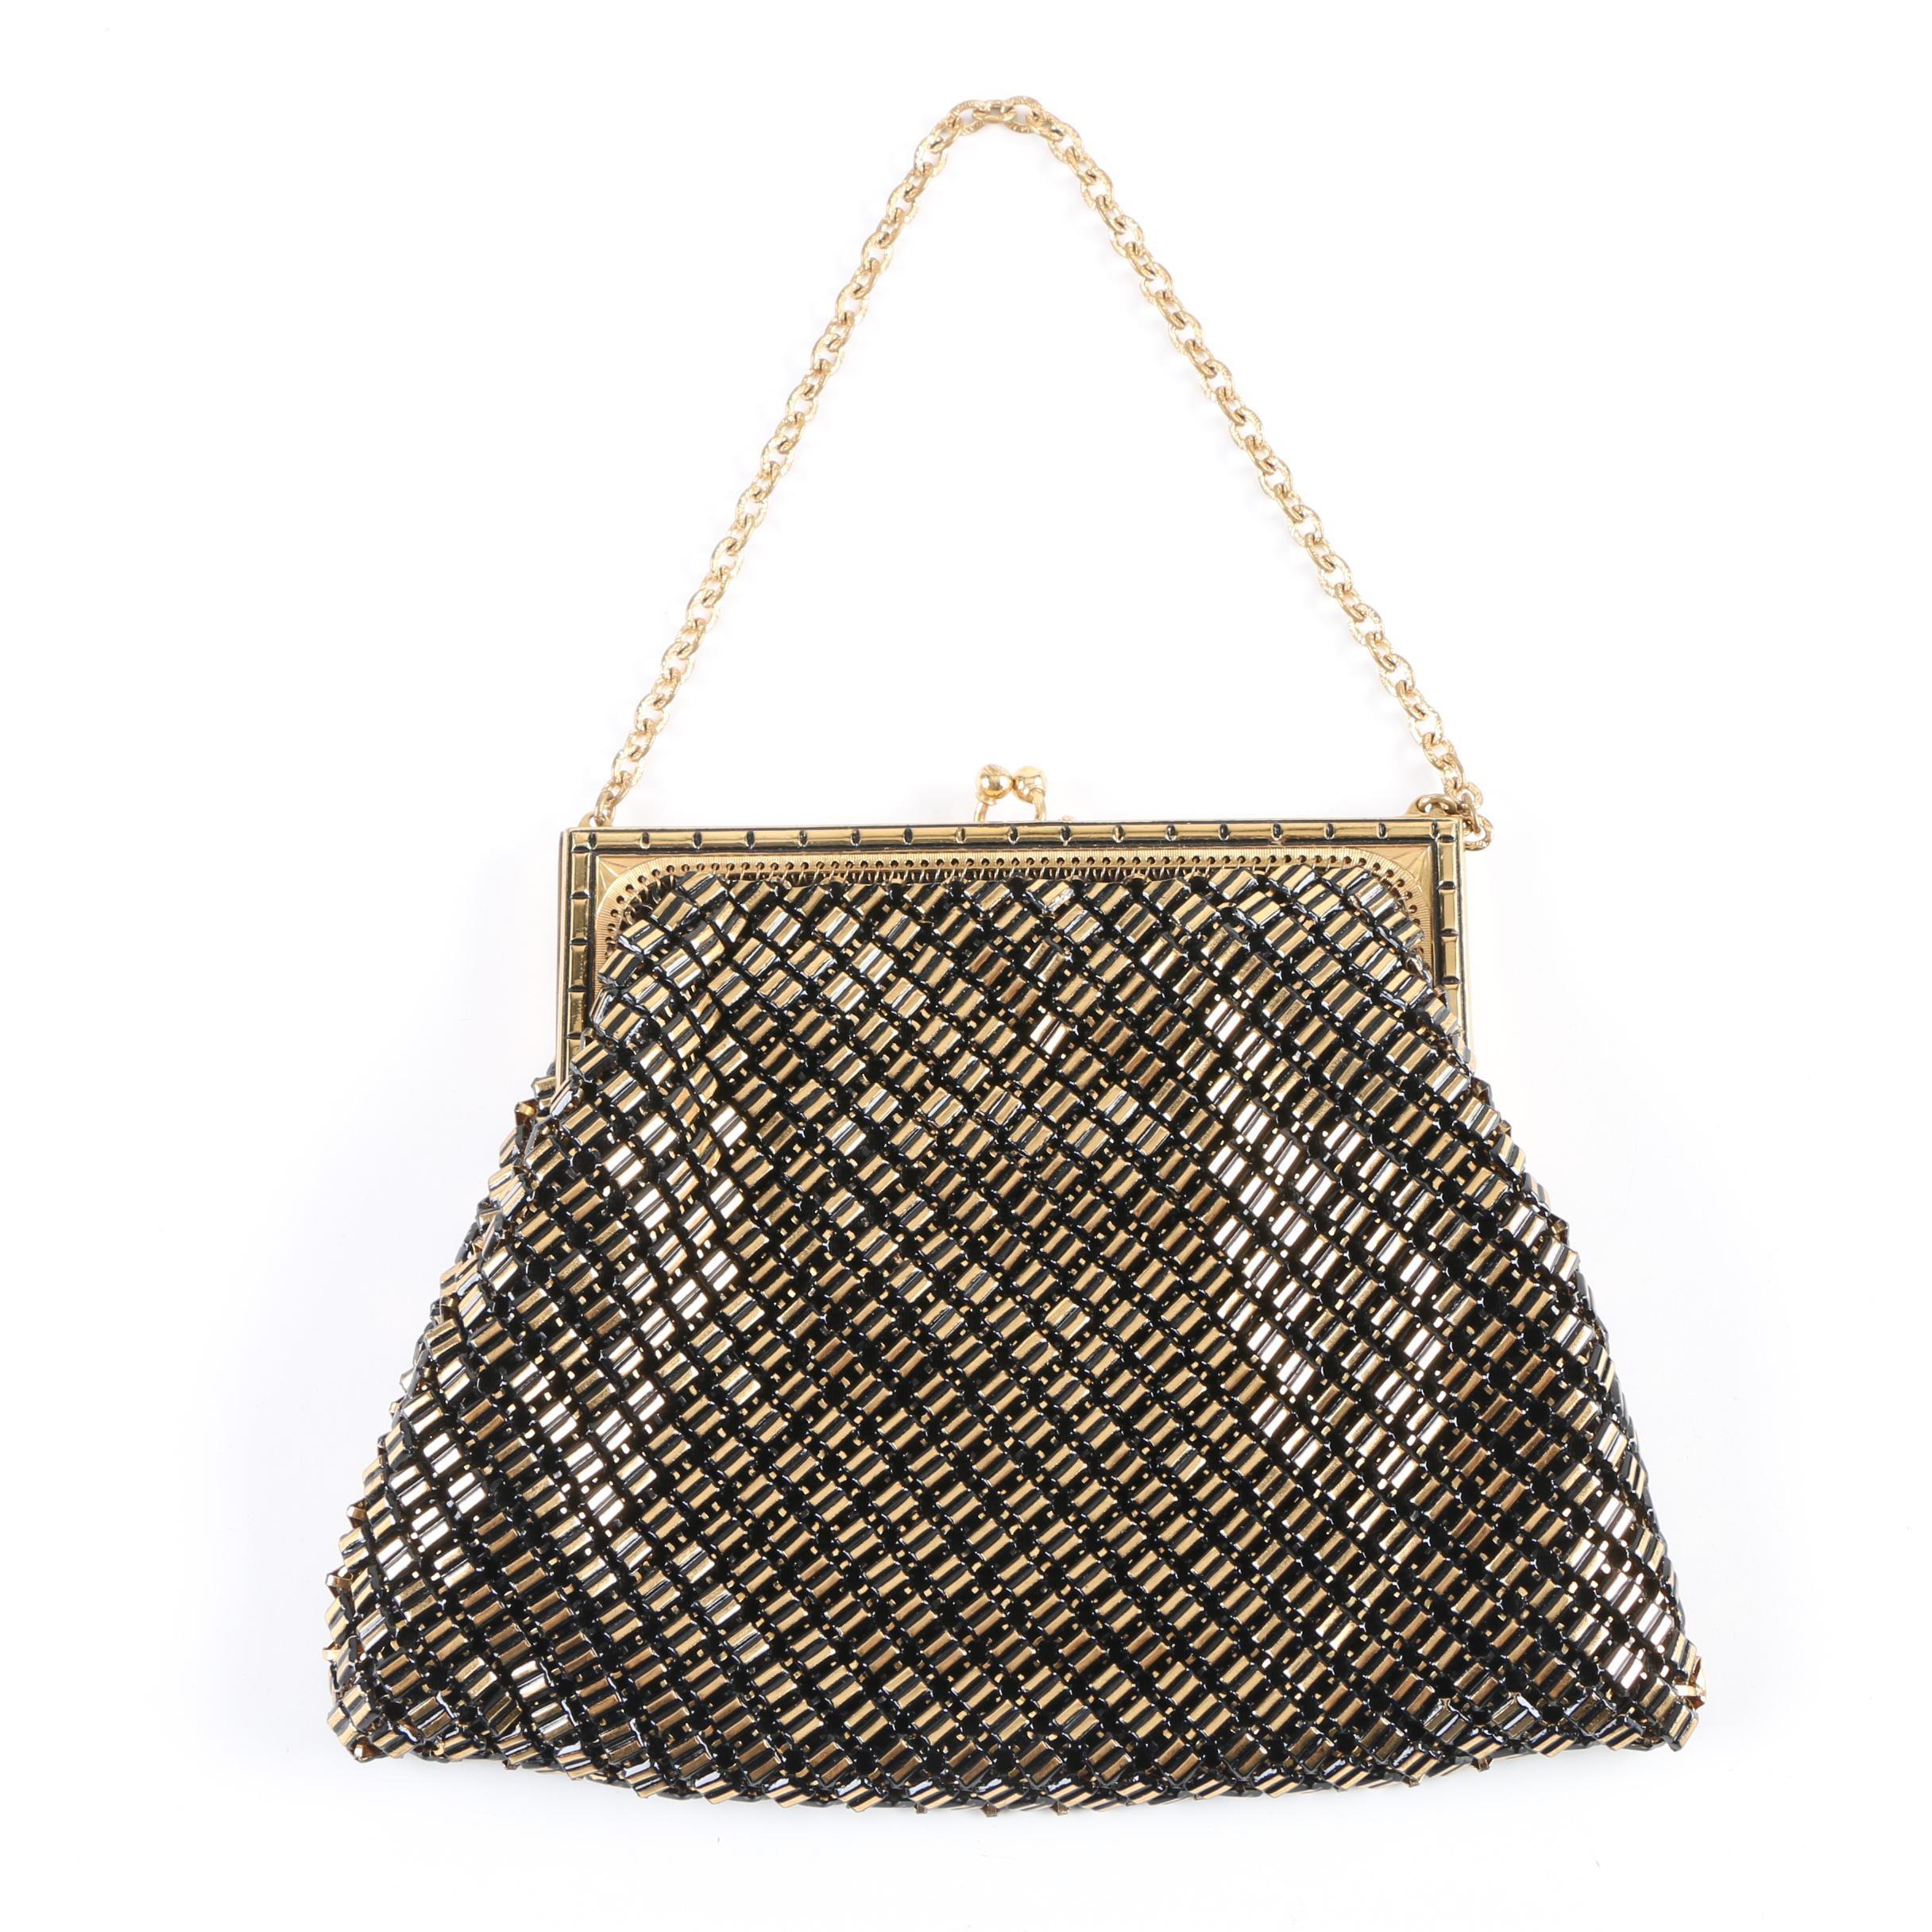 Vintage Whiting & Davis Co. Gold Tone Mesh Bag with Original Box